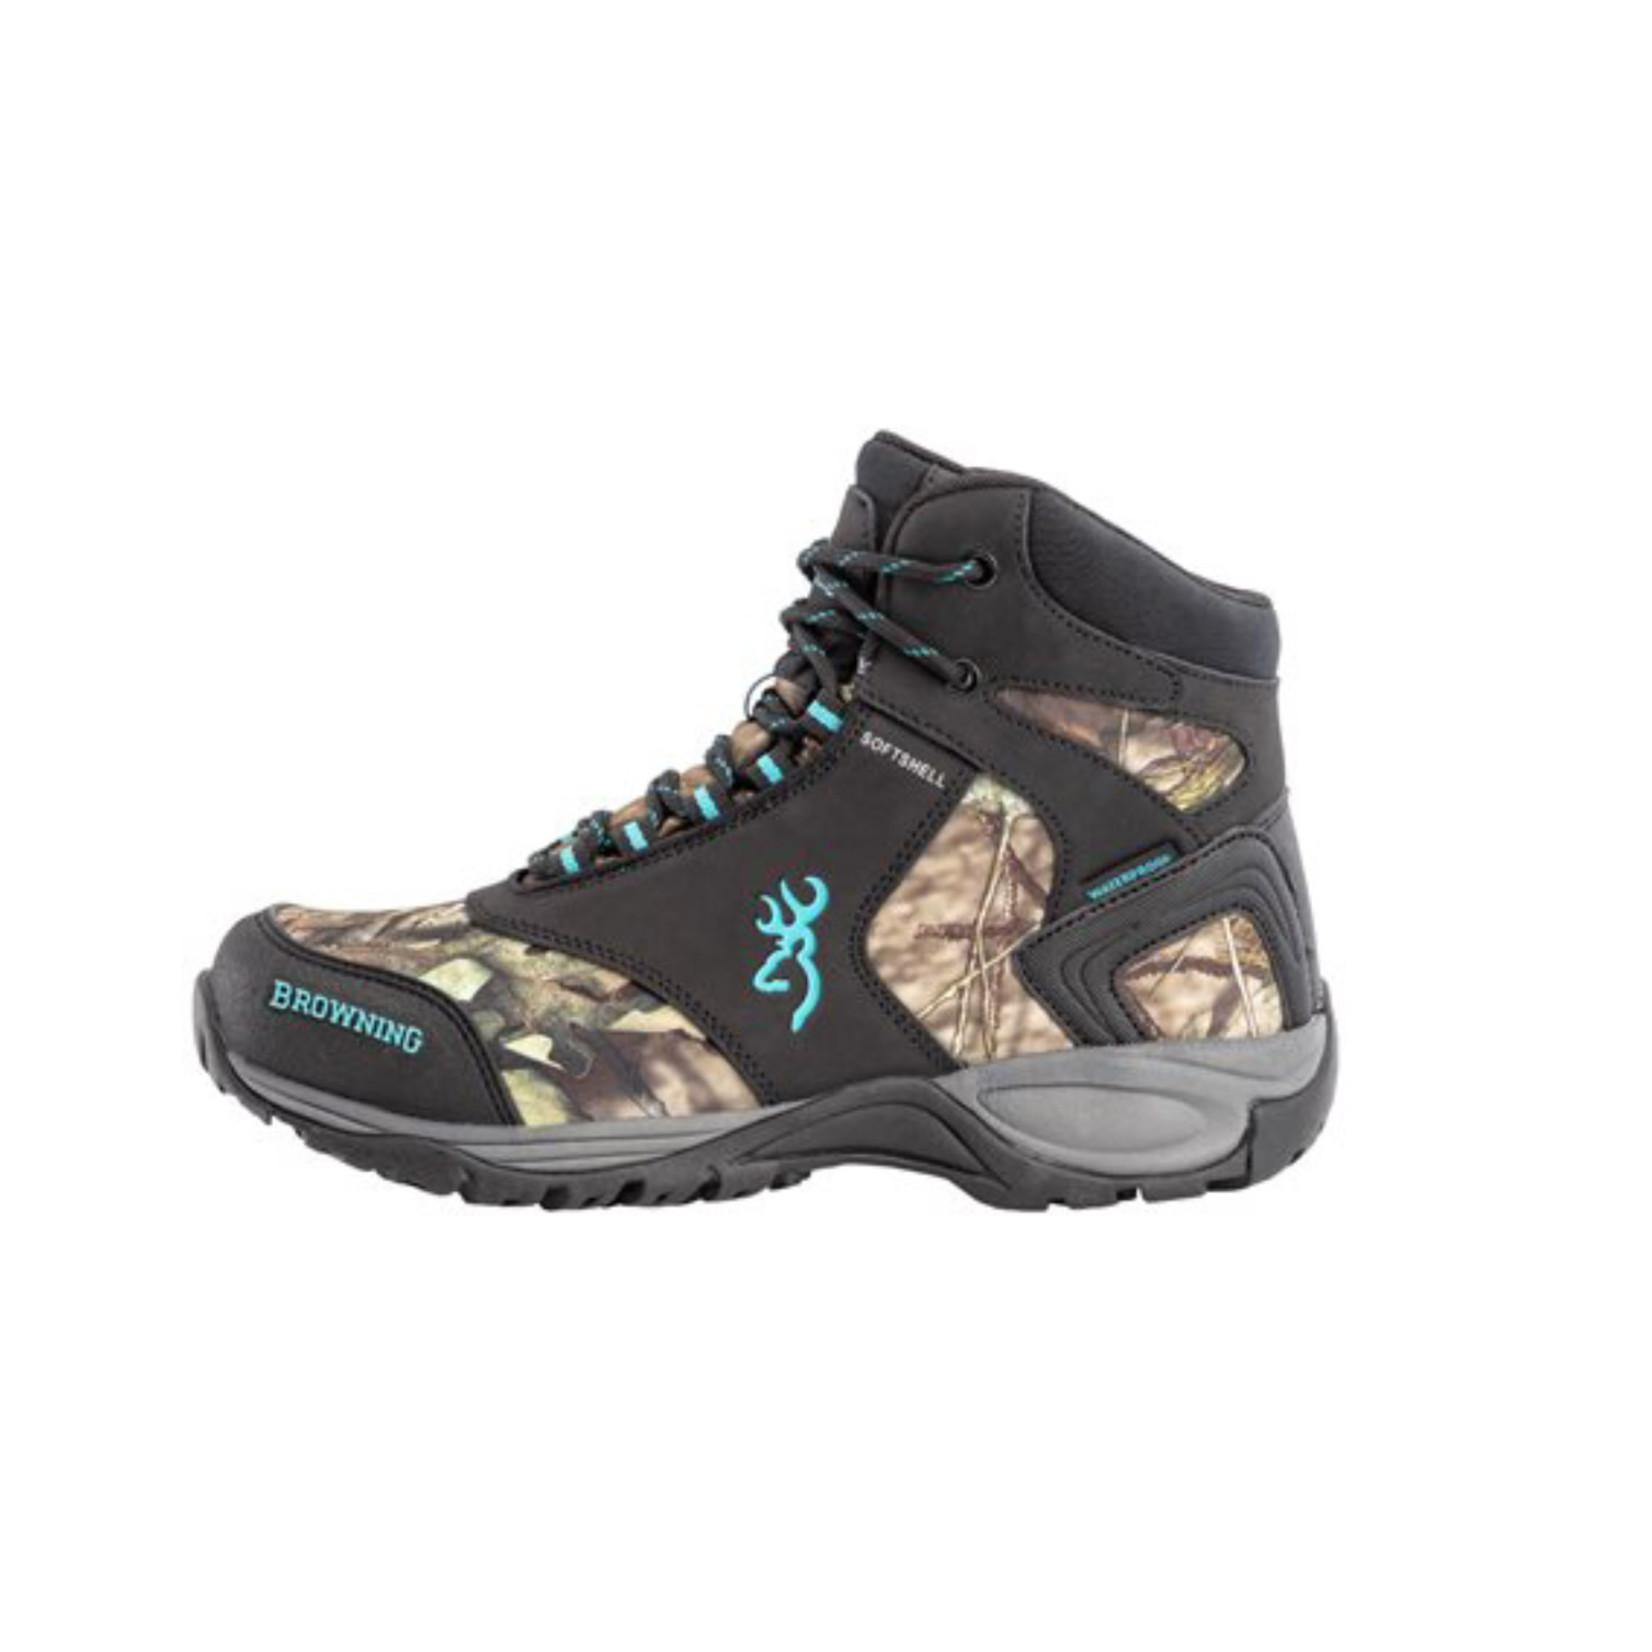 Sportchief Browning Women's Plainsman Mid Mossy Oak Waterproof  Hunting Boot 538016-615